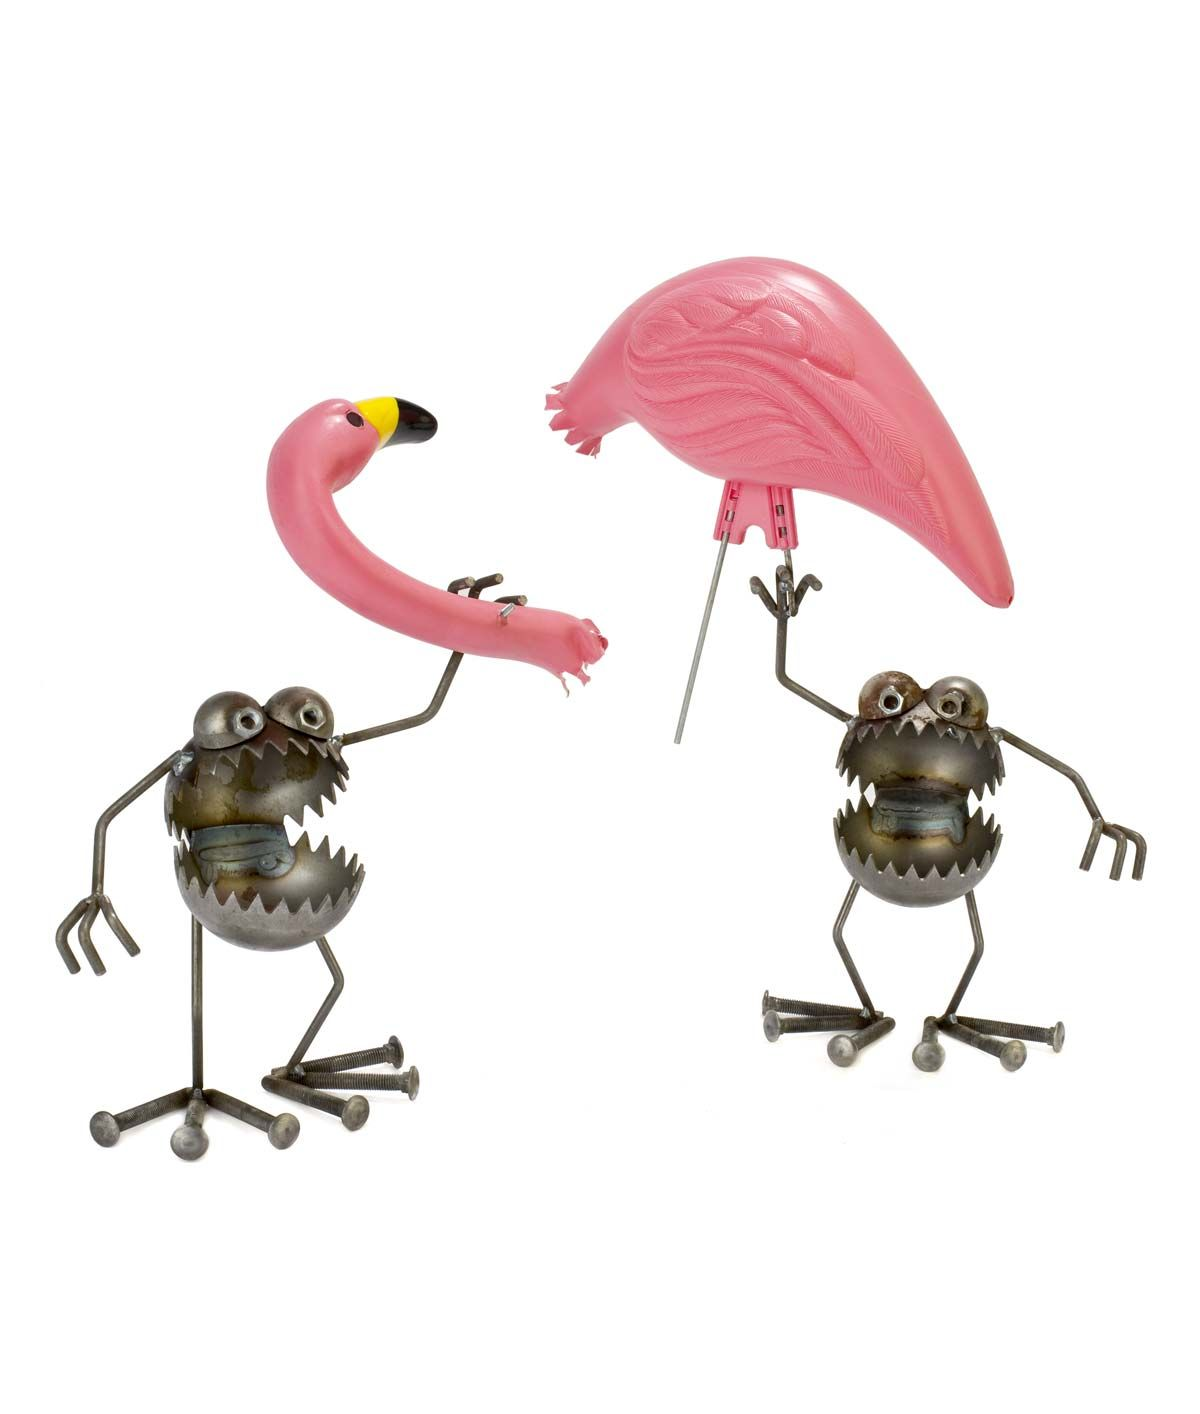 Flamingo Away Sculpture Gnome Be Gones Fred Conlon 400 x 300